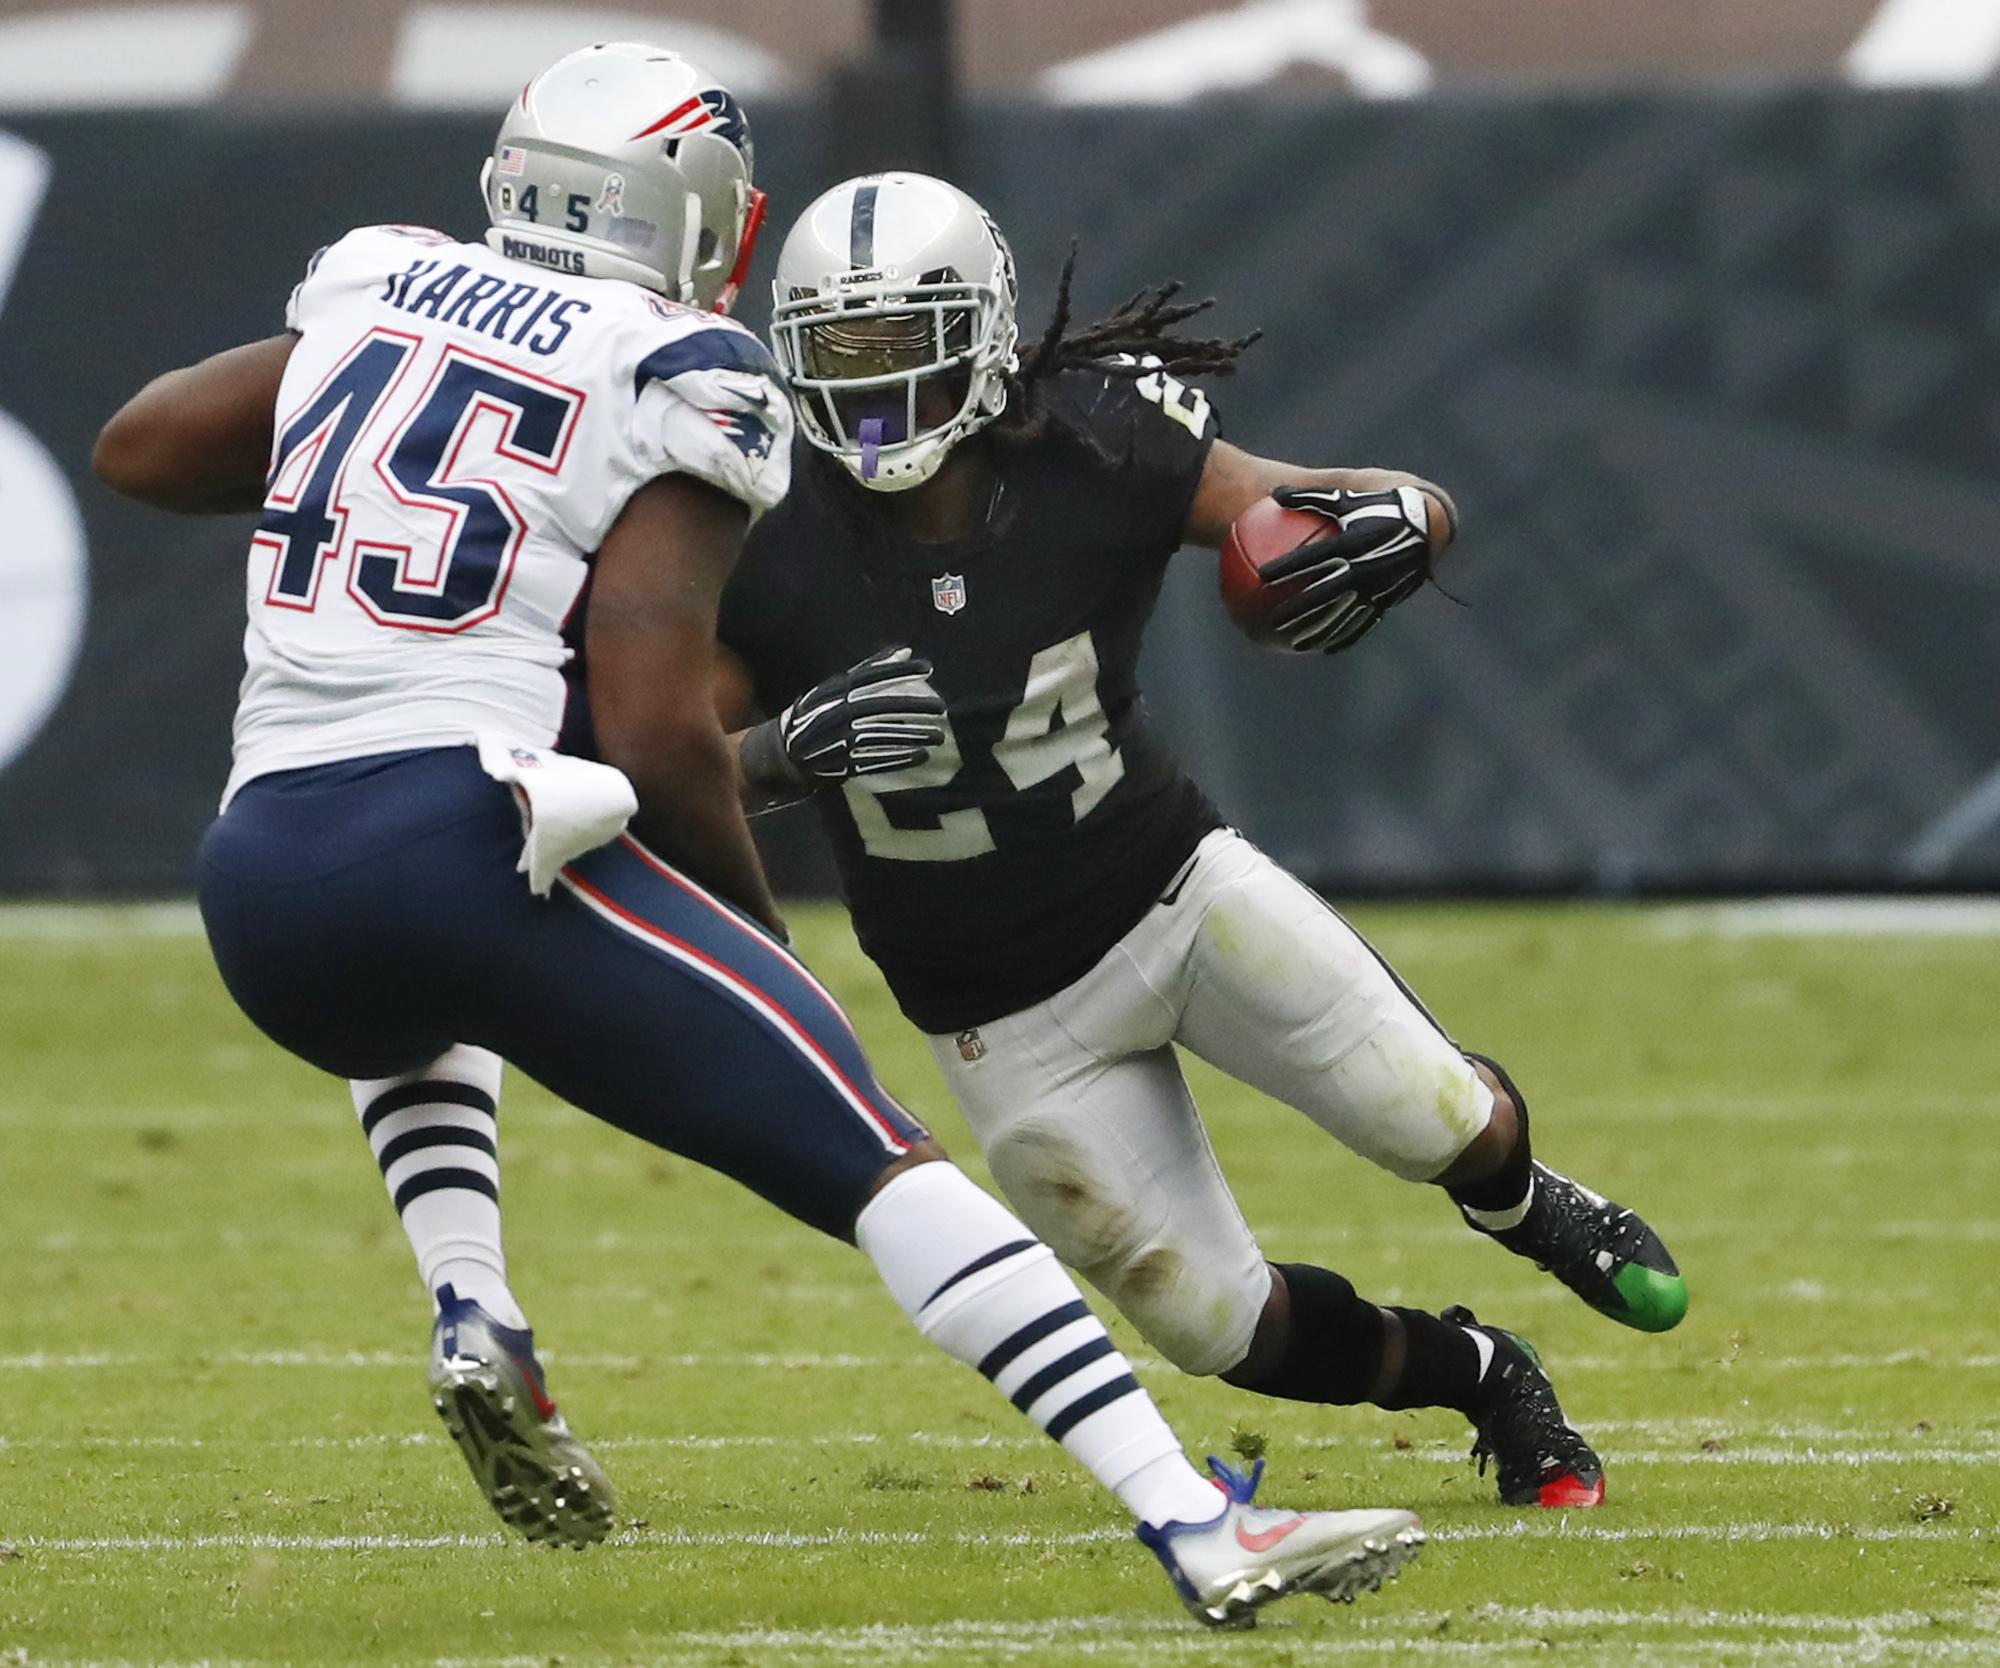 ba6a3a35f78 Patriots linebacker David Harris retires - The Boston Globe